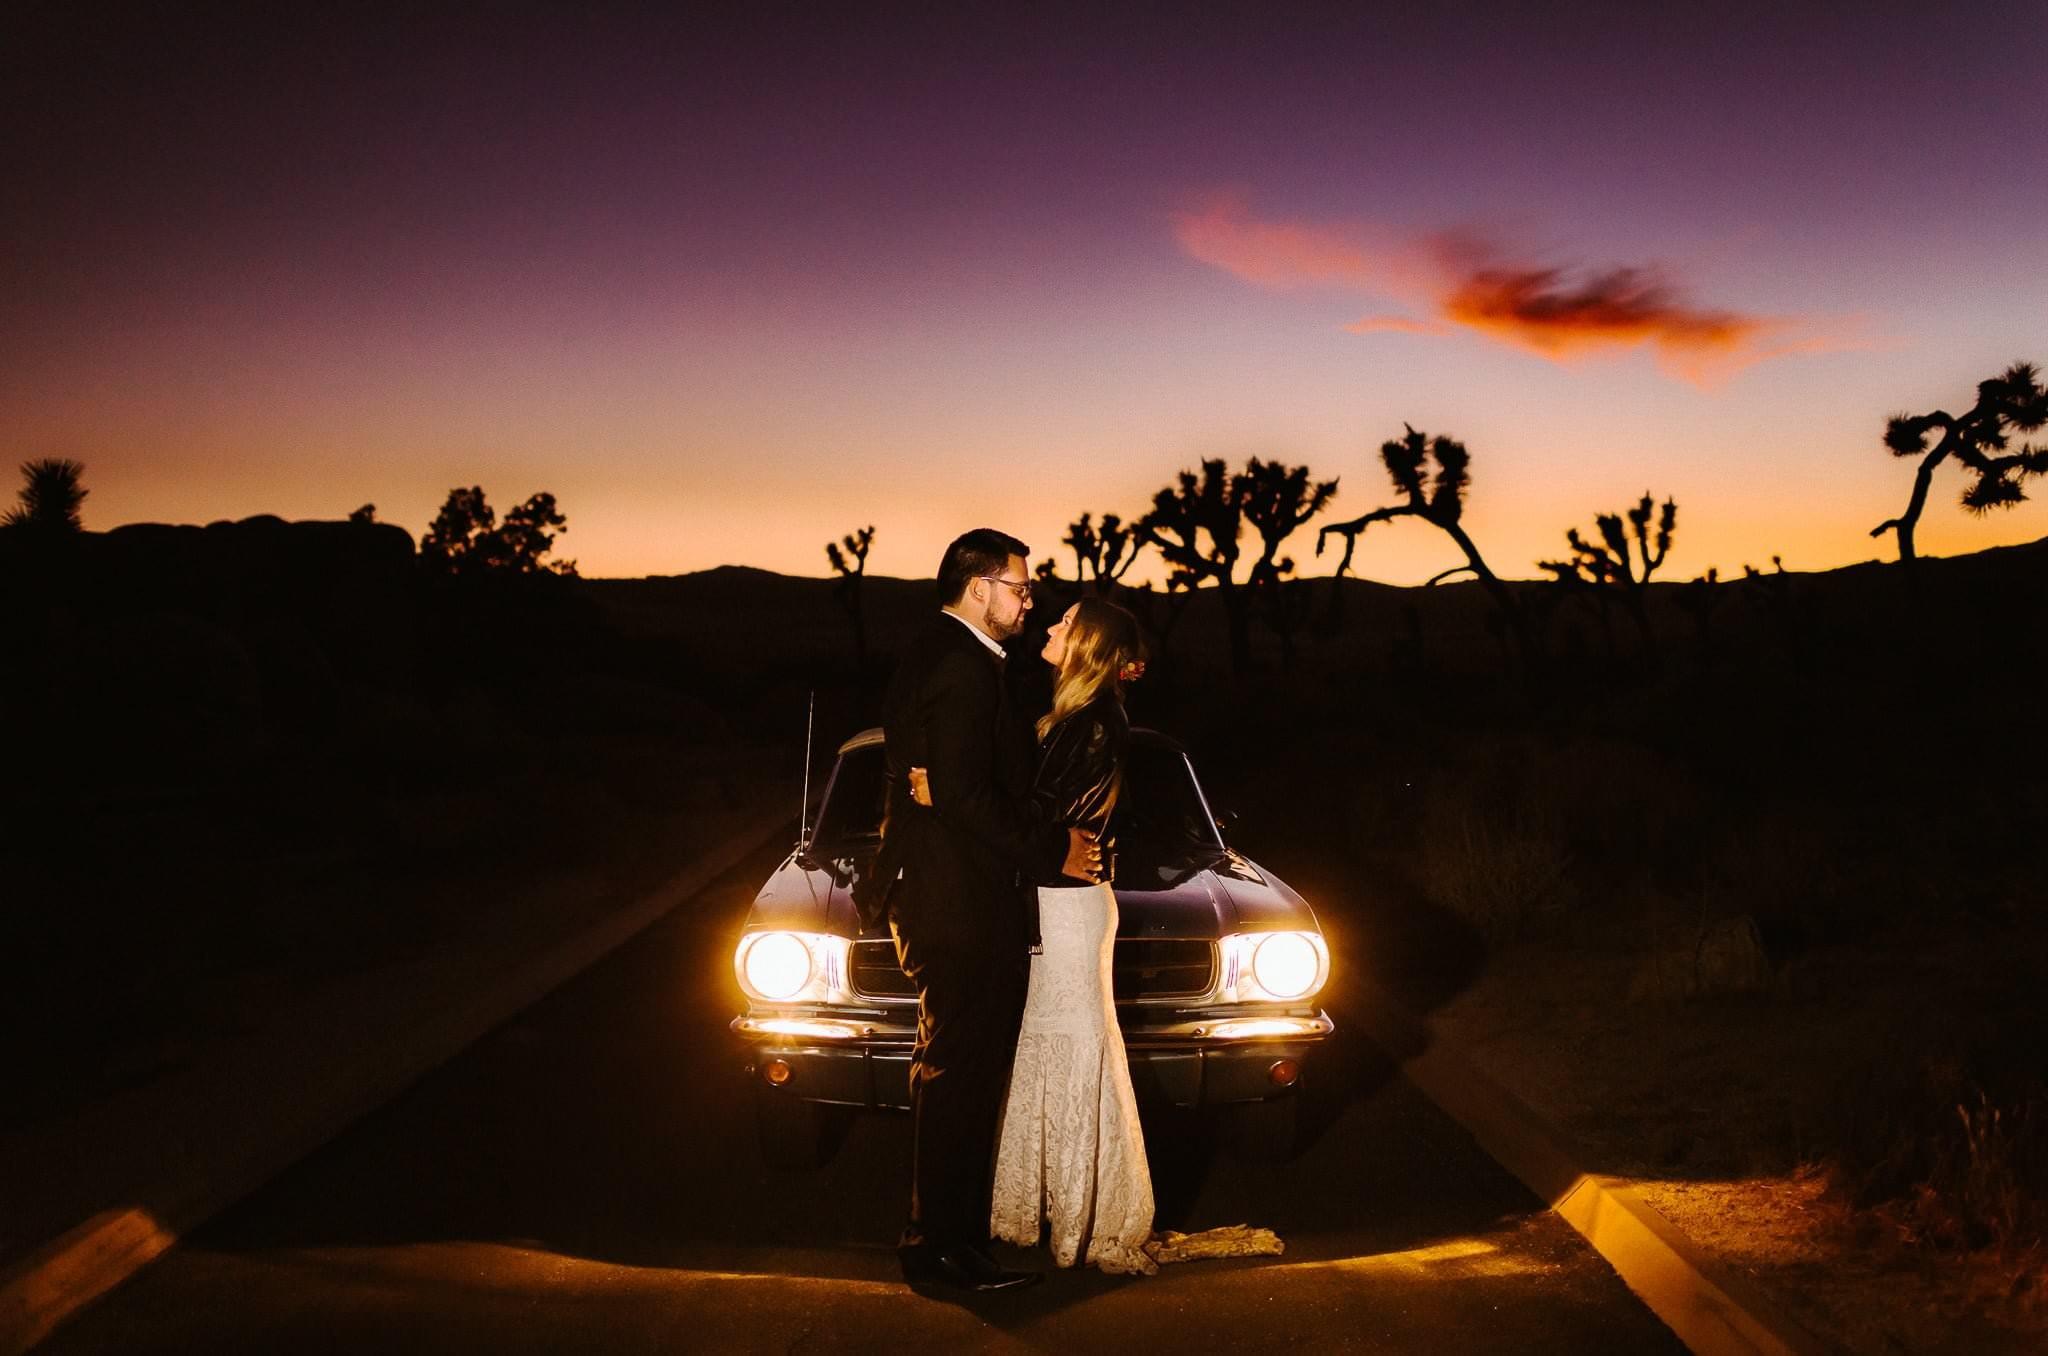 millwick wedding photography 017 1